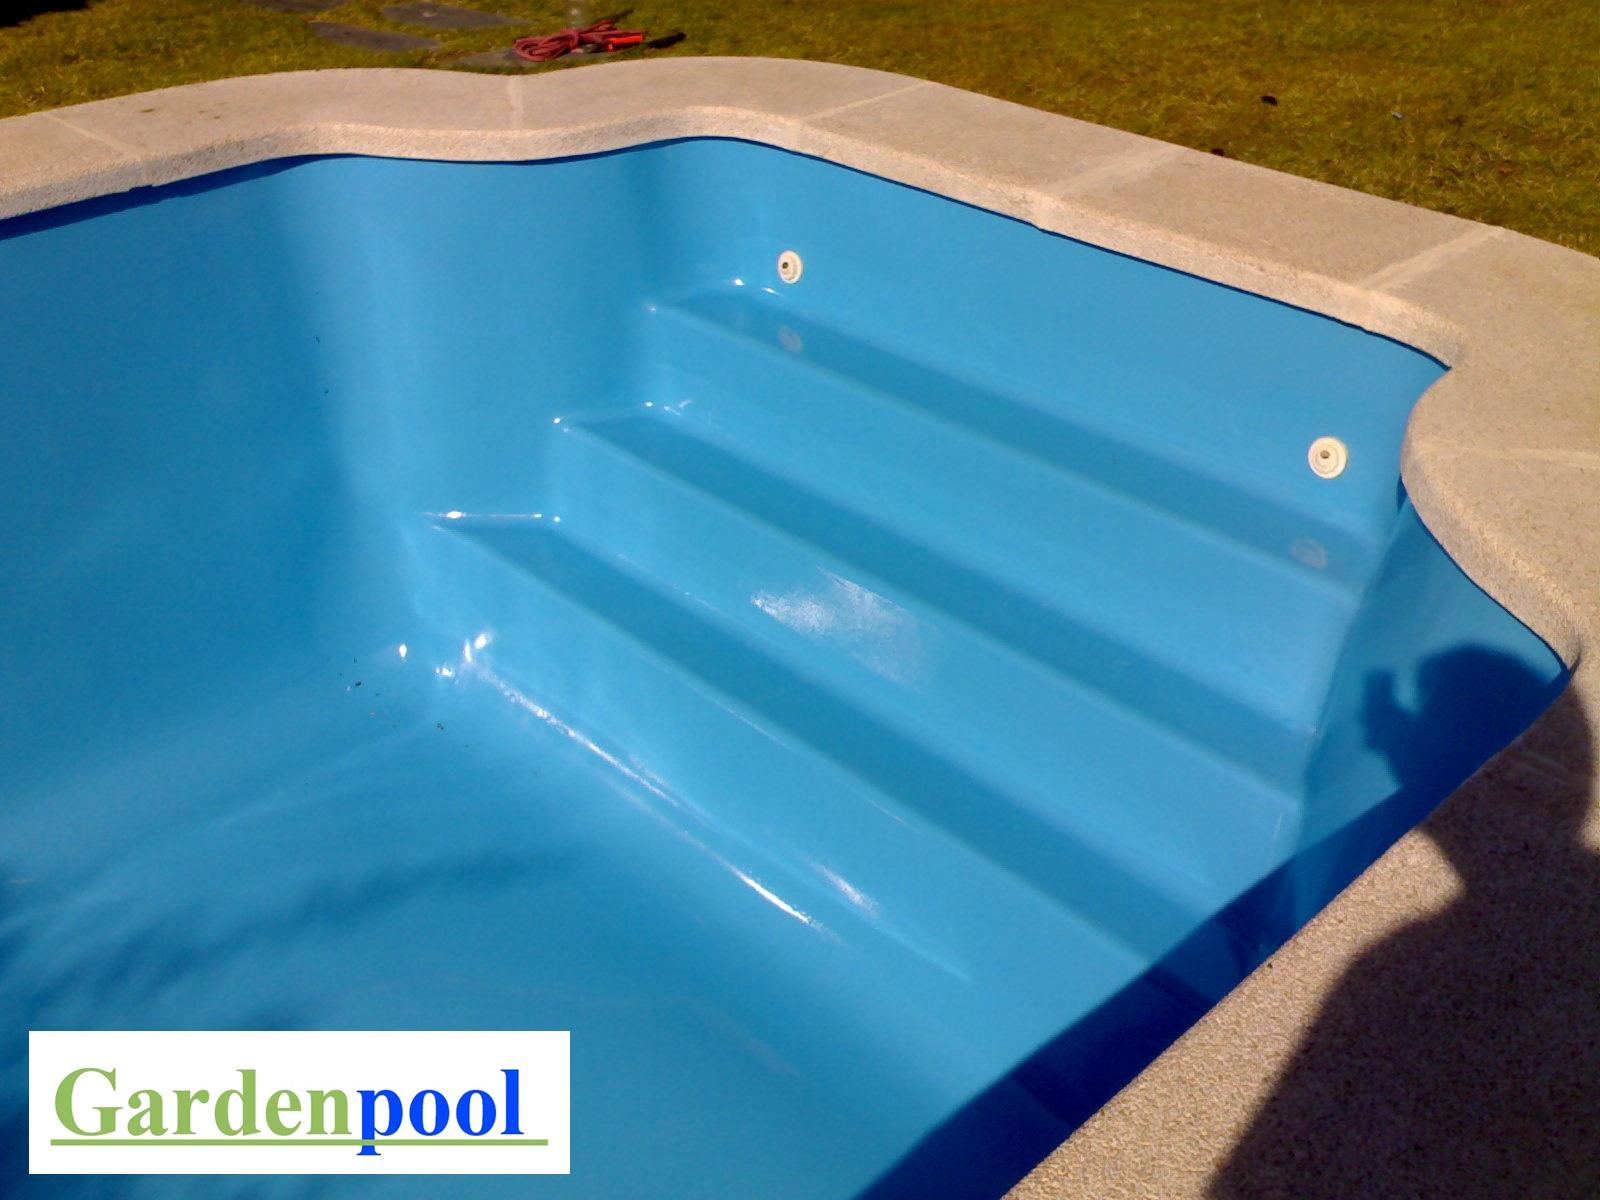 Pintura para piscina poliester fibra de vidrio Madrid GARDENPOOL